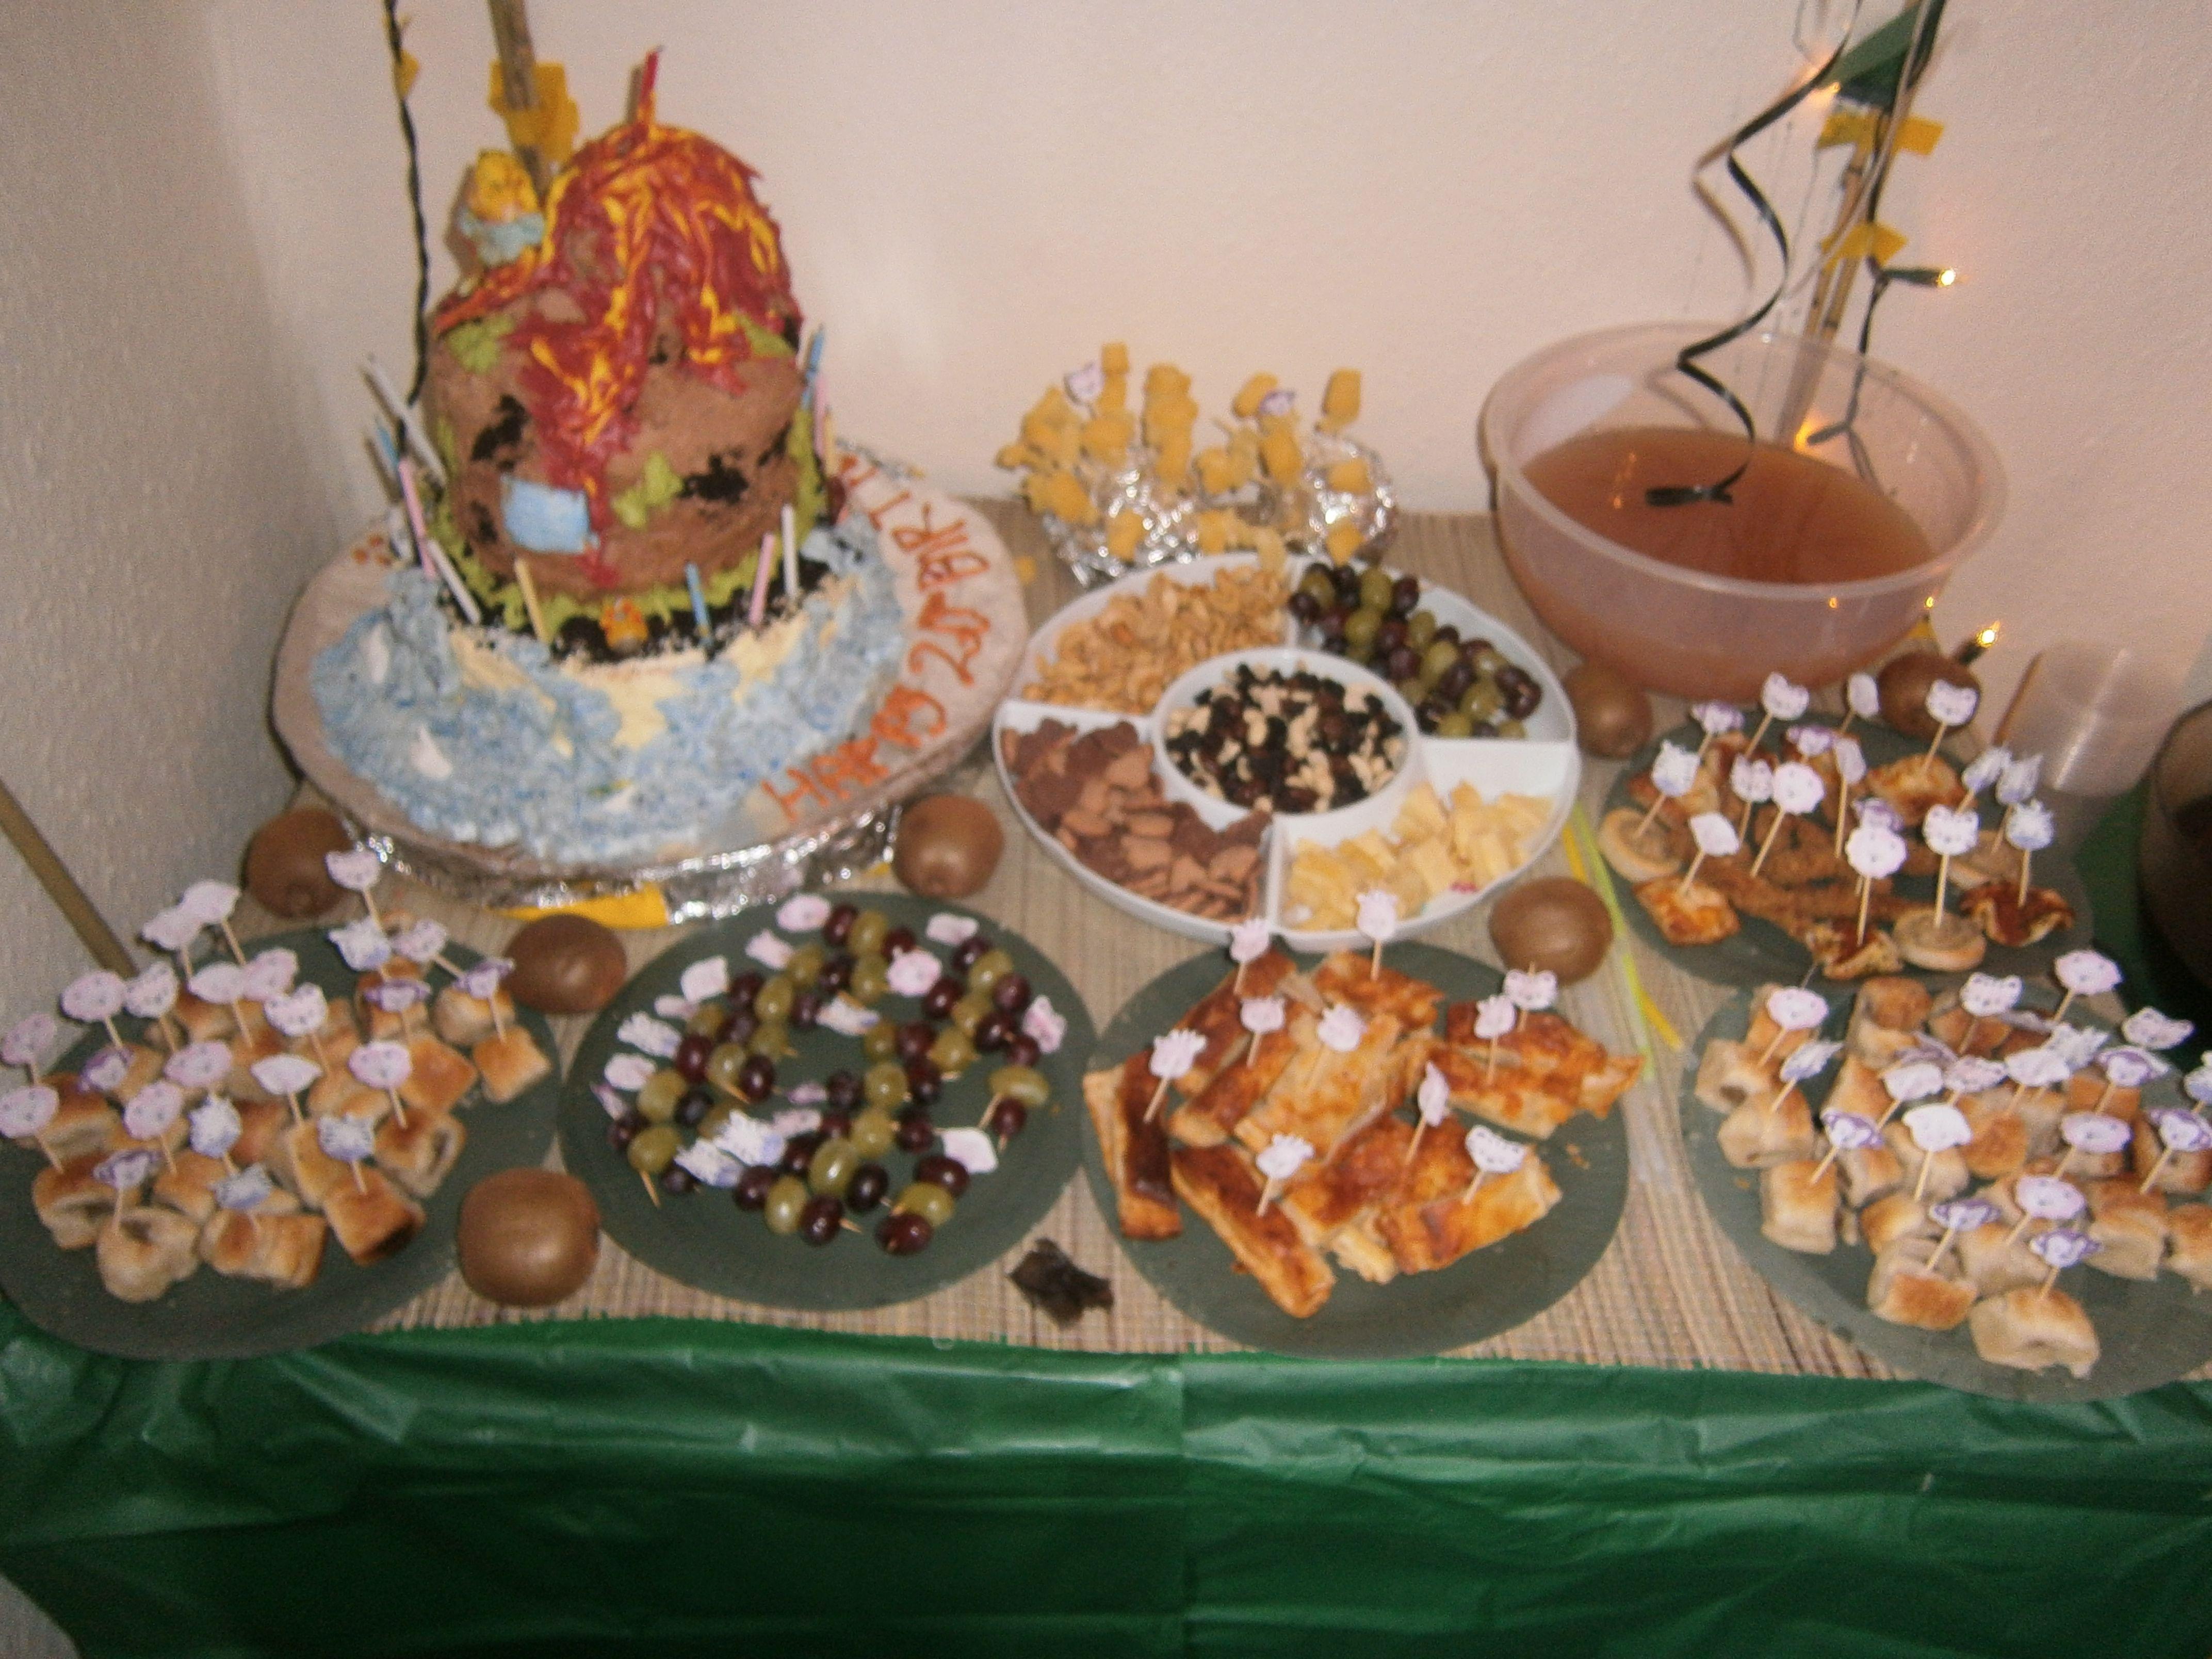 Volcano cake and jungle theme food we had a New ZealandJungle